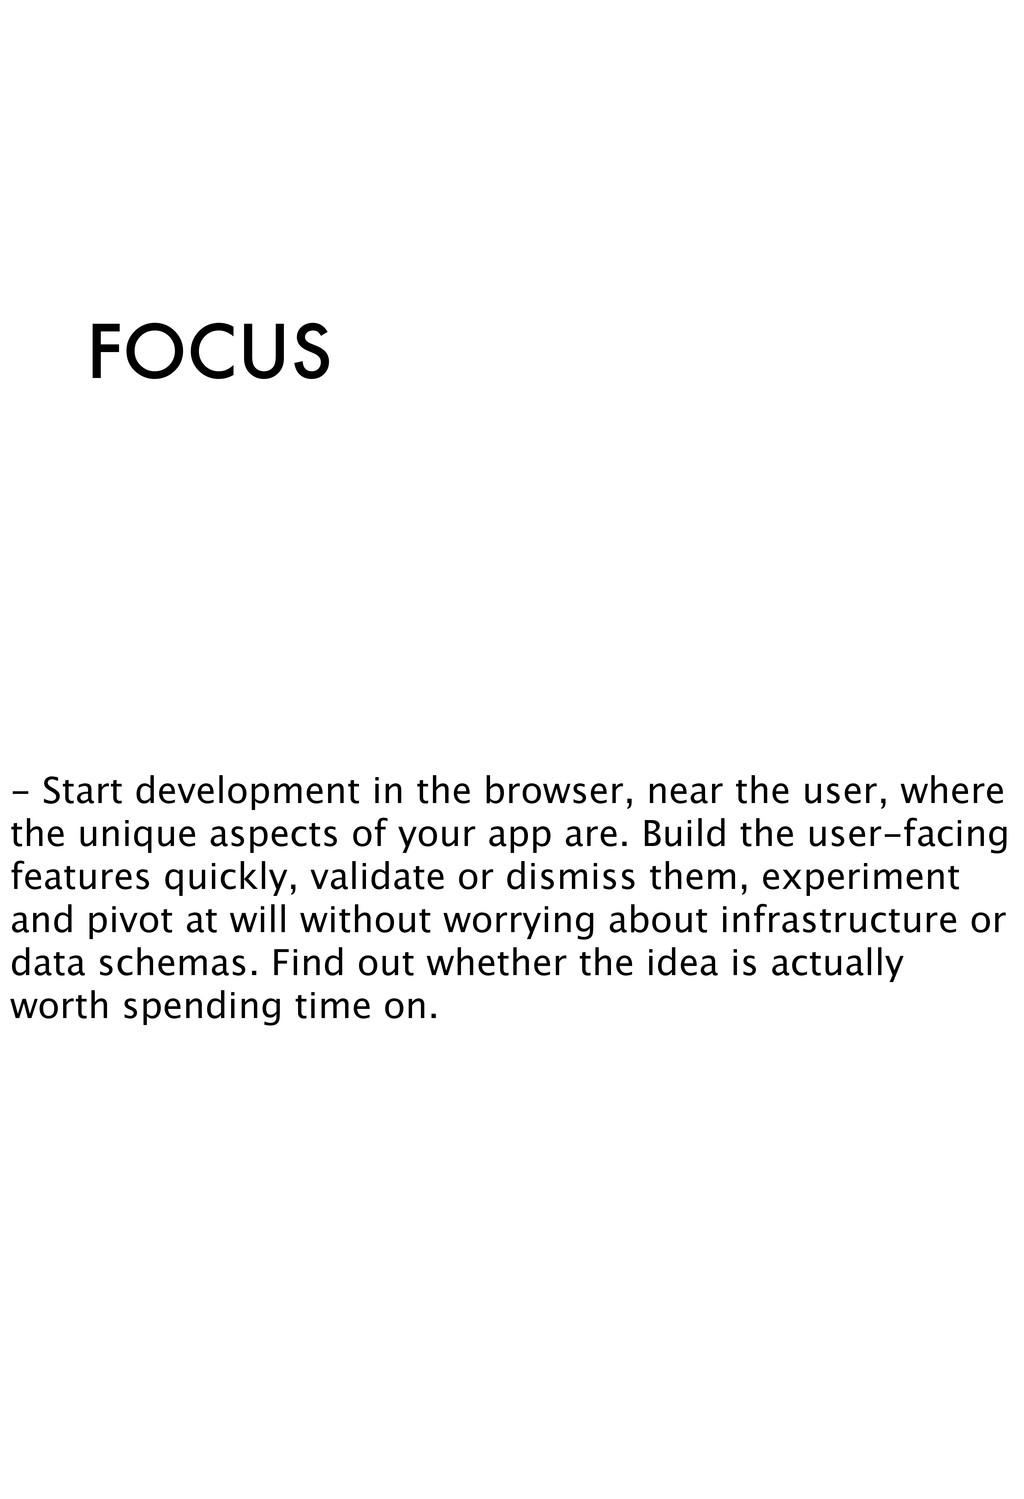 FOCUS - Start development in the browser, near ...